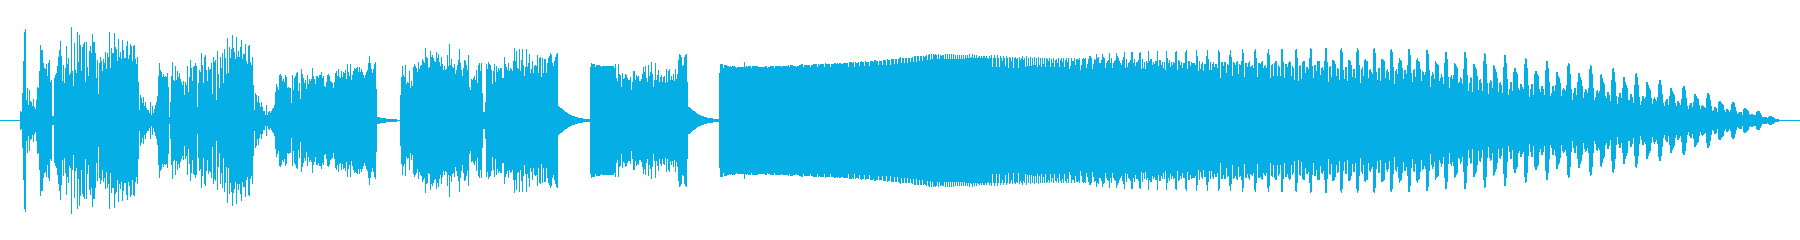 Electrozapperスワイプ5の再生済みの波形